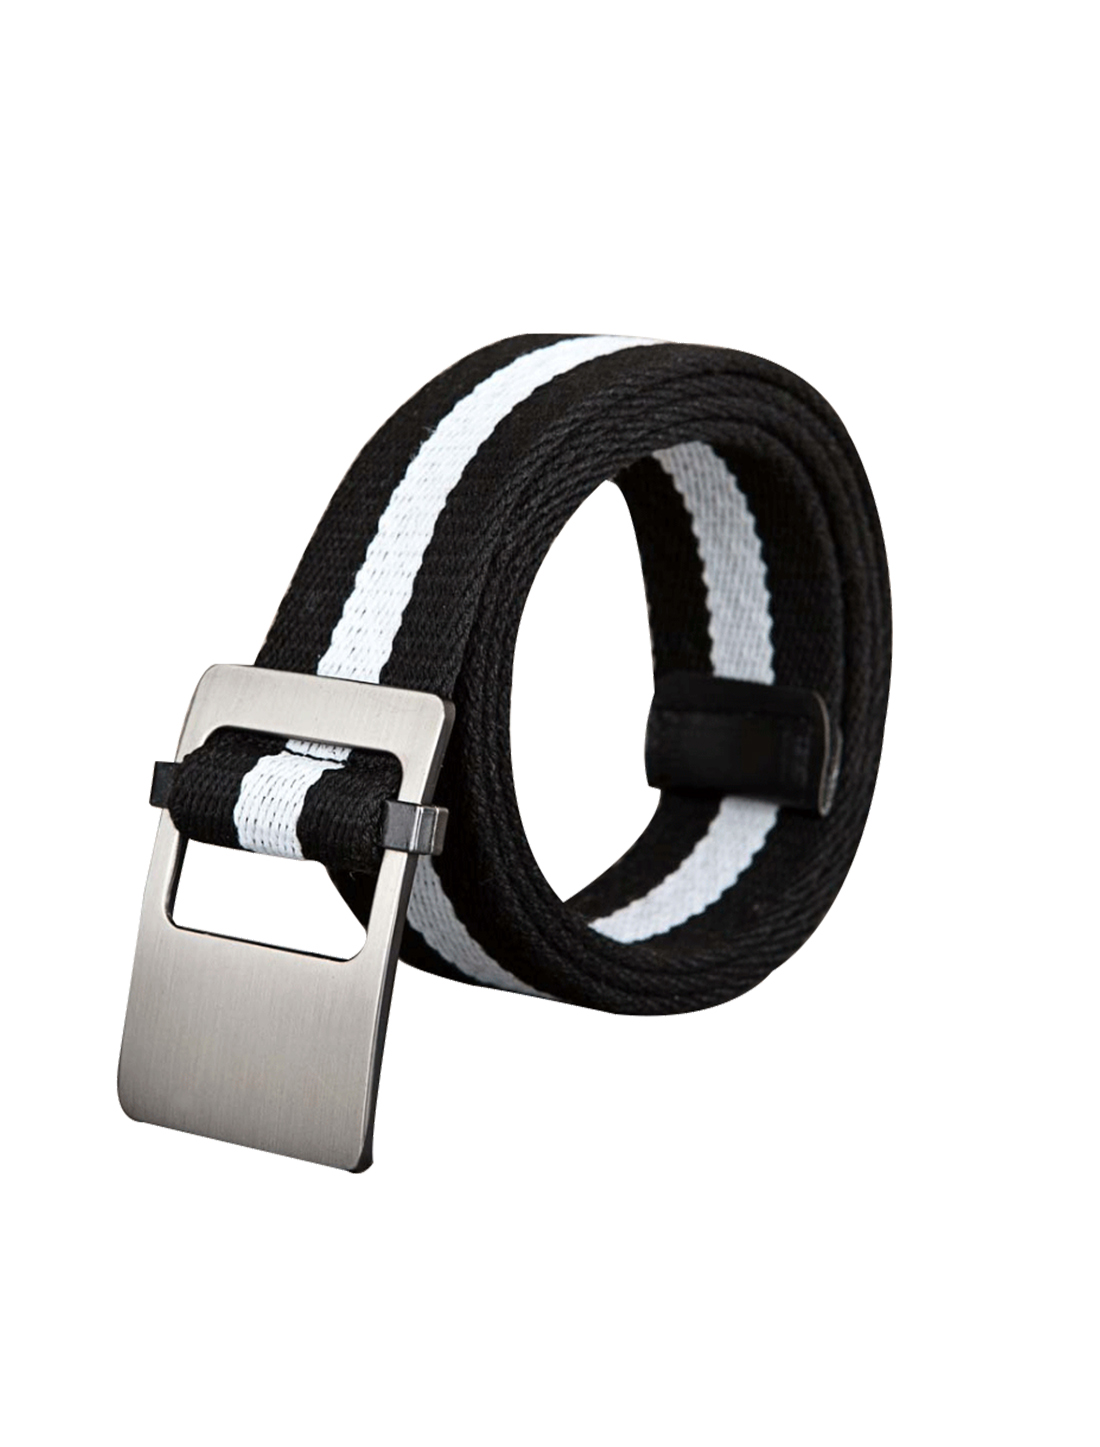 Unisex Canvas Adjustable Holeless Flat Metal Buckle Stripe Belt Black